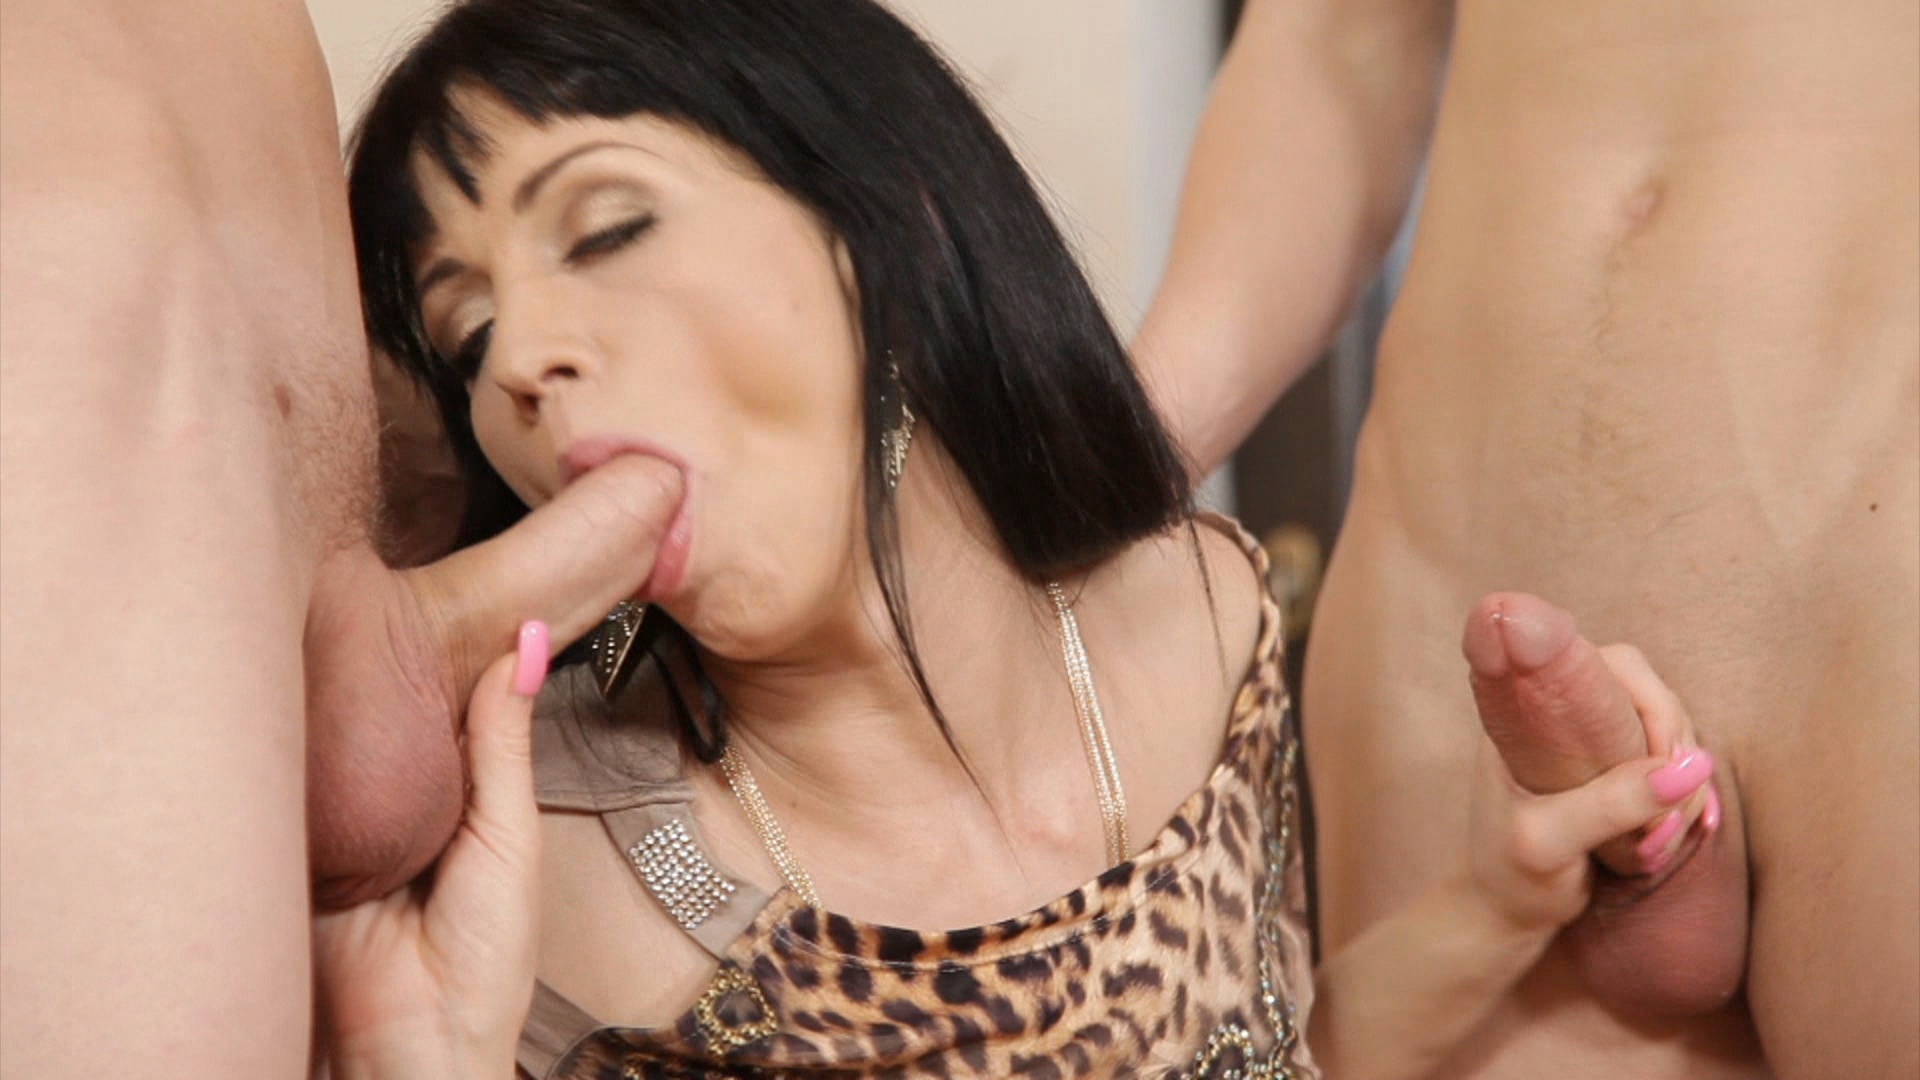 Bi-Sexual Cuckold 5 xvideos175325